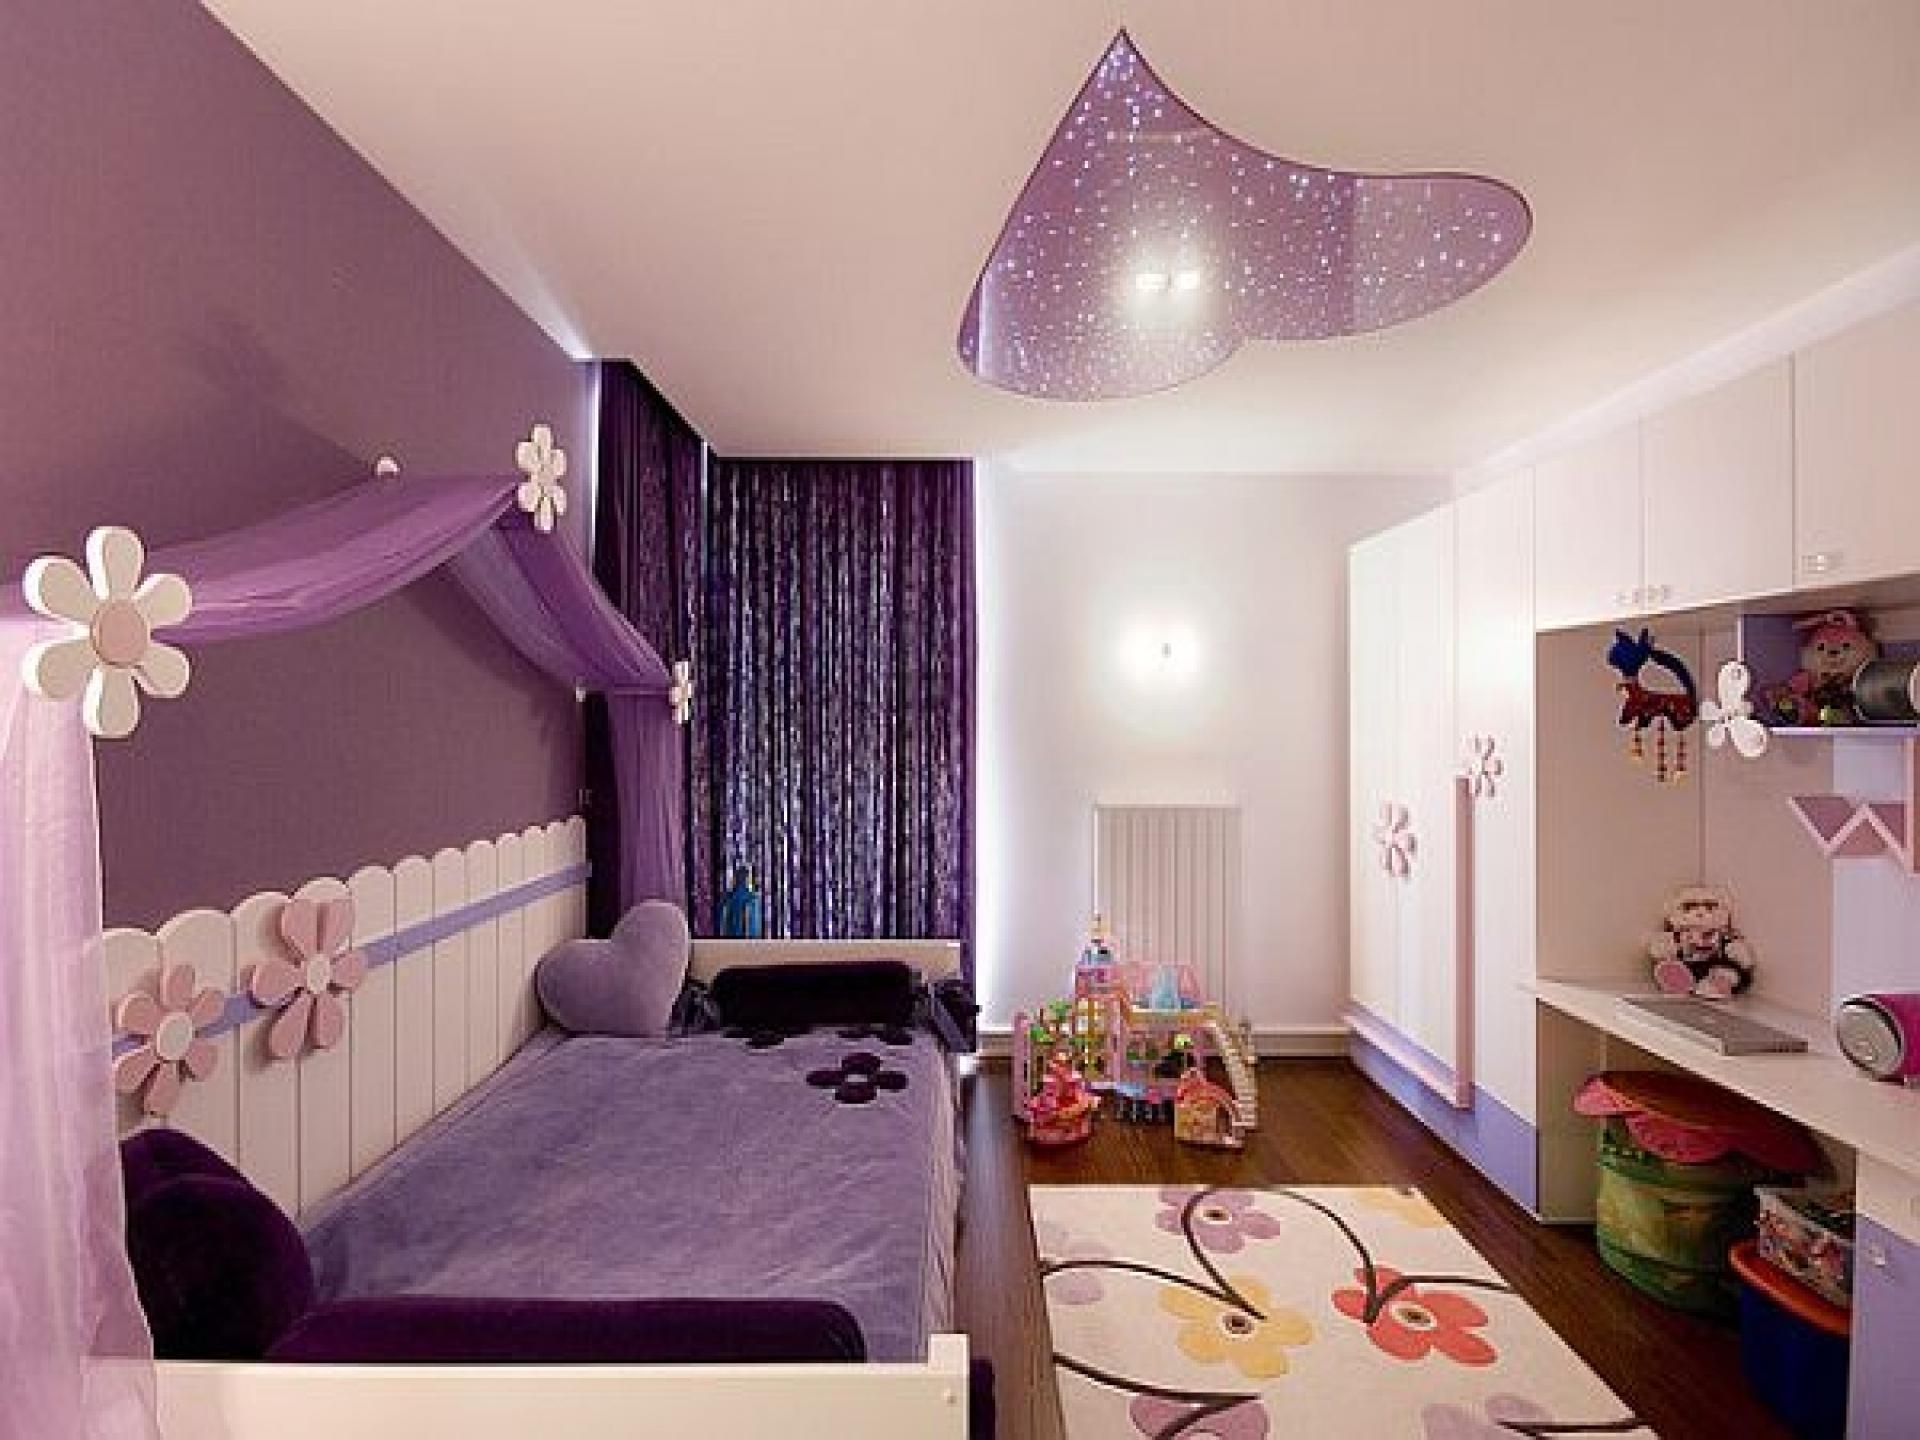 purple color room idea photo - 6